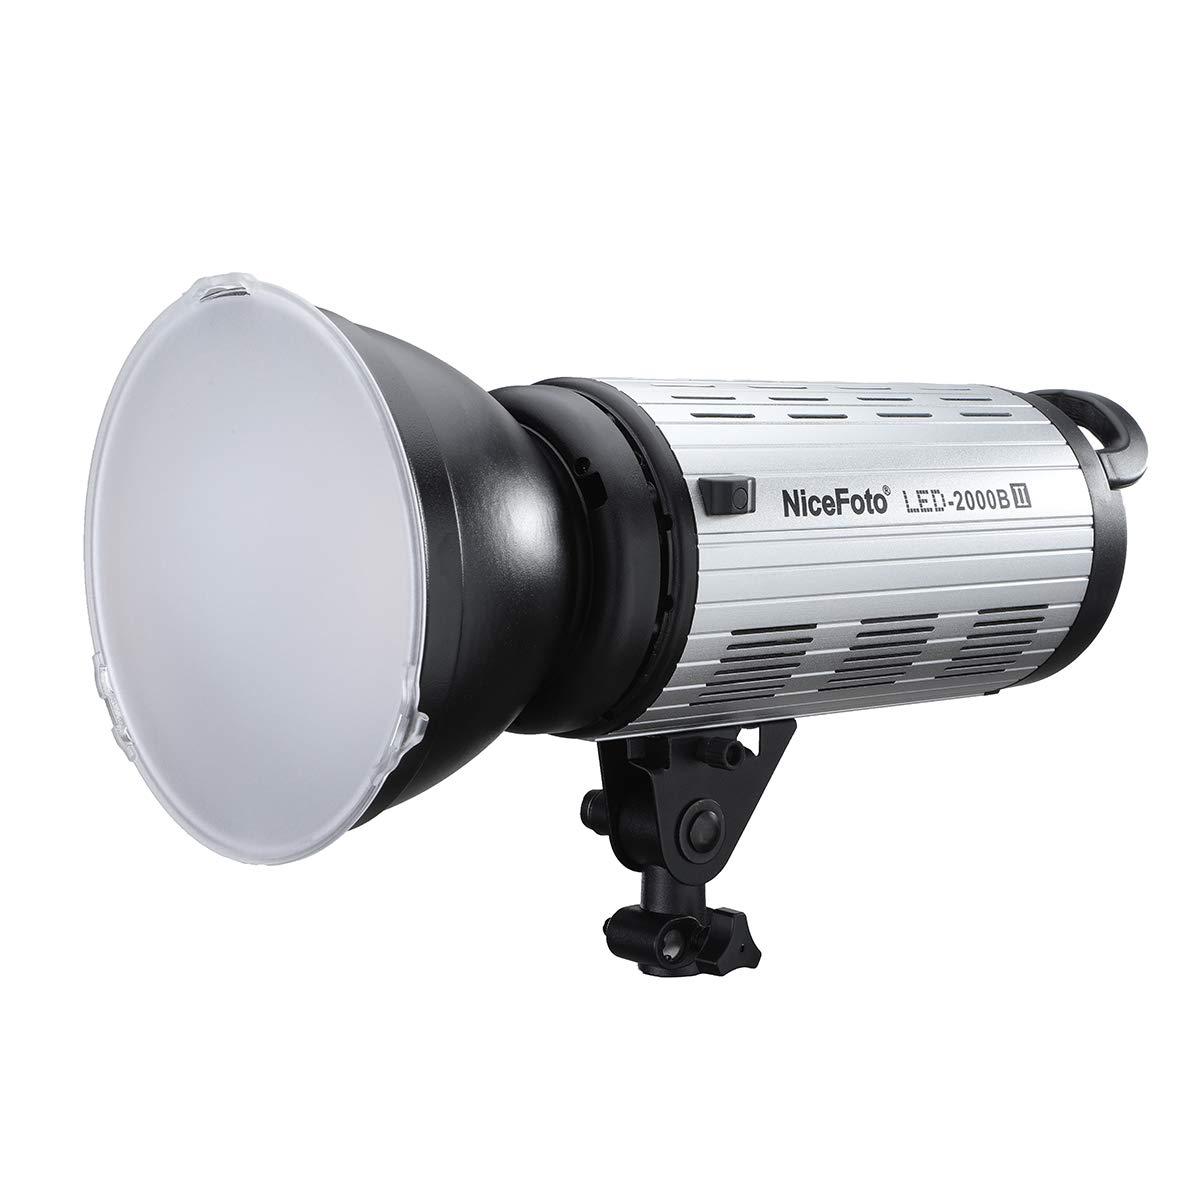 NiceFoto 200W 3200K/5600K 静音ファン bowensマウント デュアル電源対応 定常光照明 撮影用 youtube,映画、ドラマ撮影対応 COBライト (LED-2000B II) LED-2000B II  B07RLBPNNX